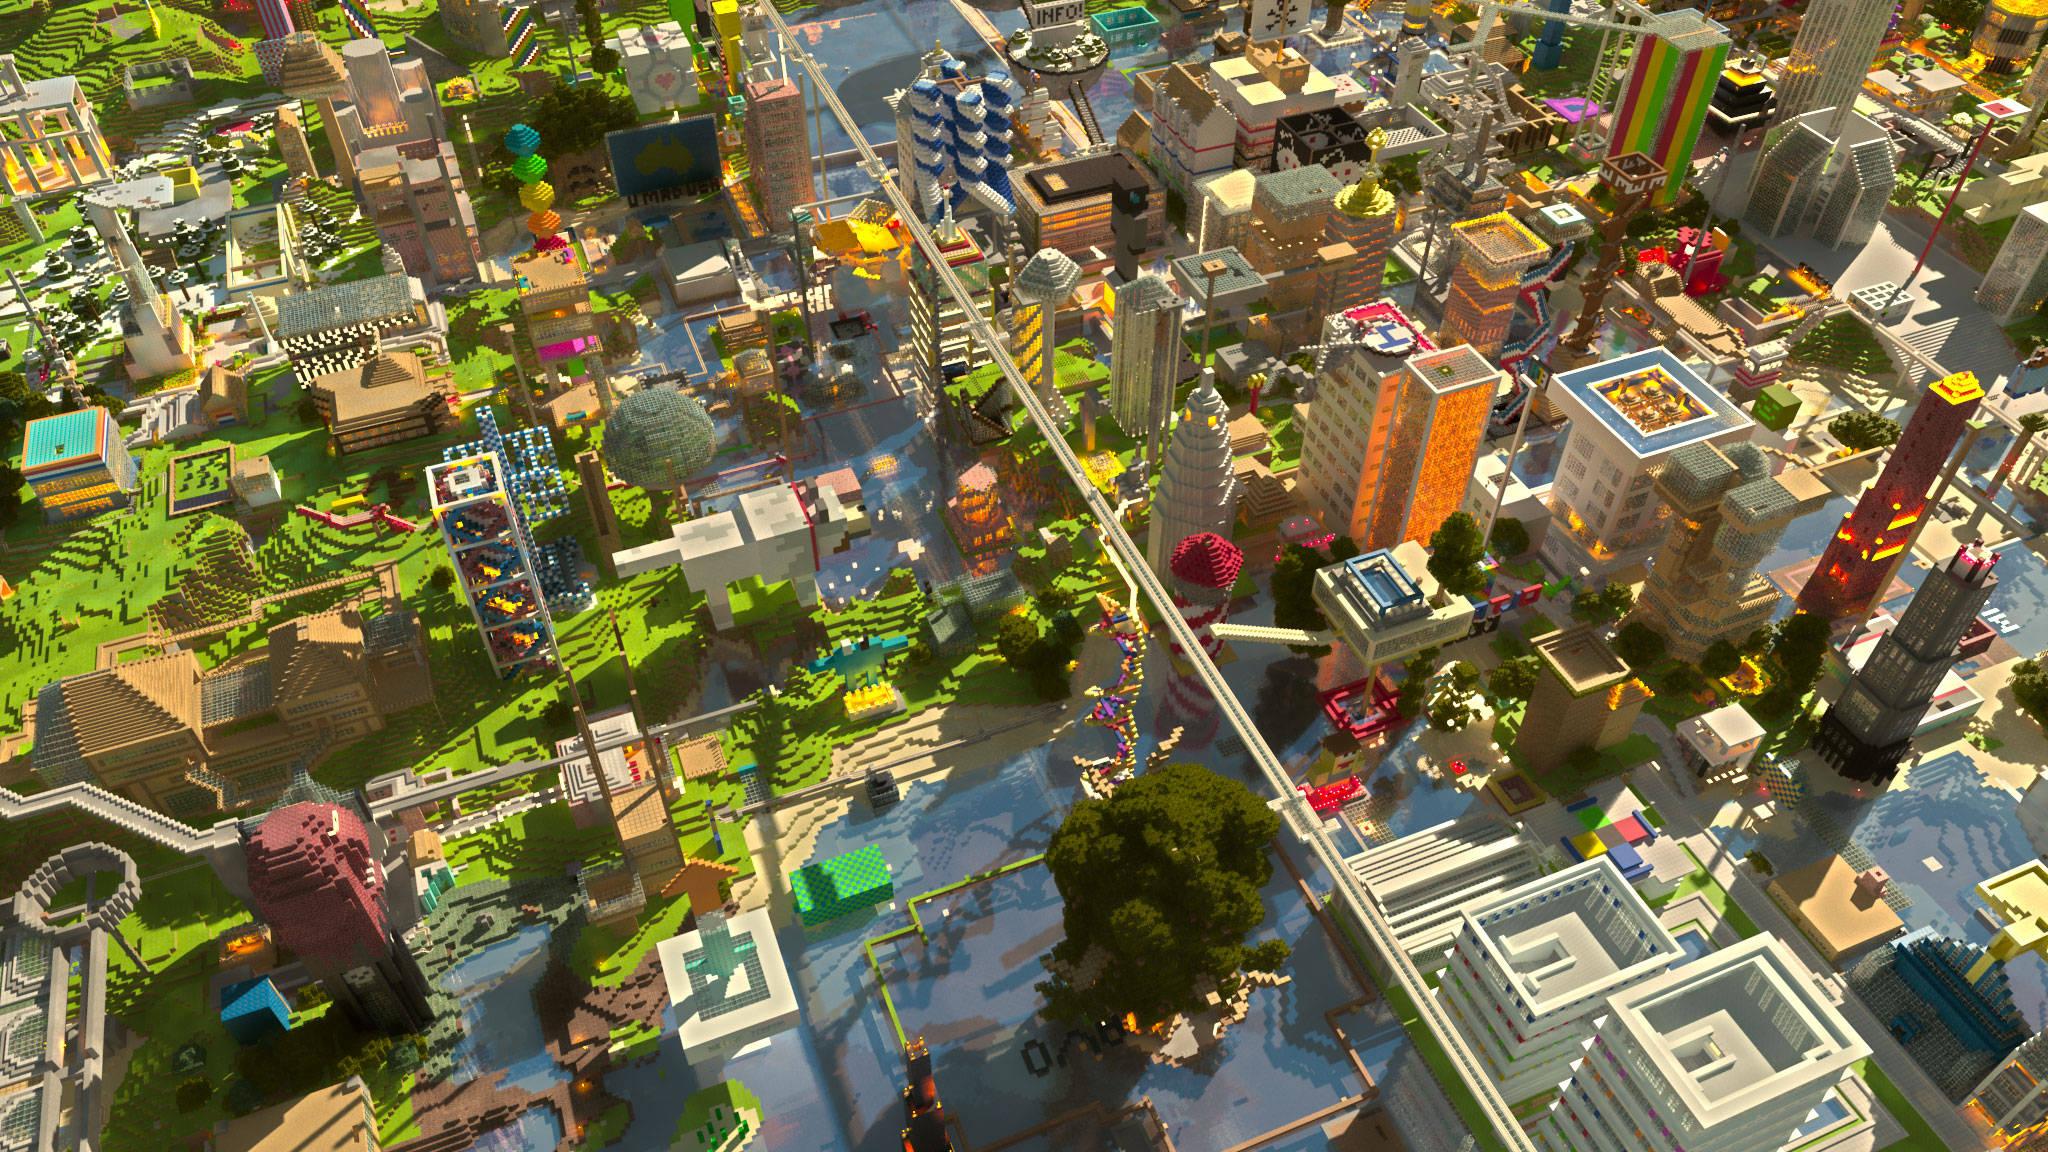 Minecraft 20482151152 Wallpaper 1115942 2048x1152